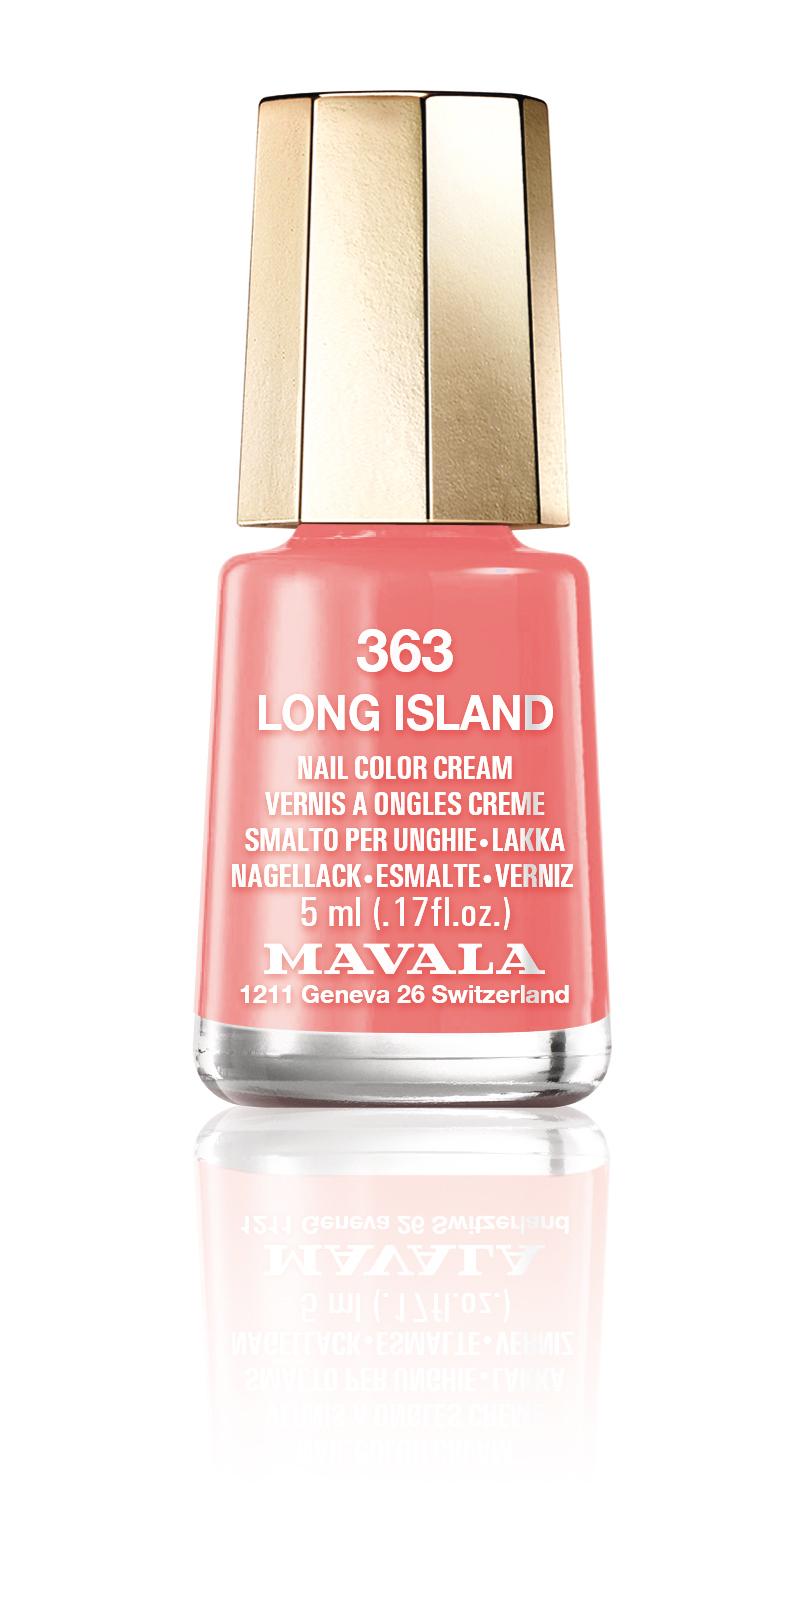 363 LONG ISLAND